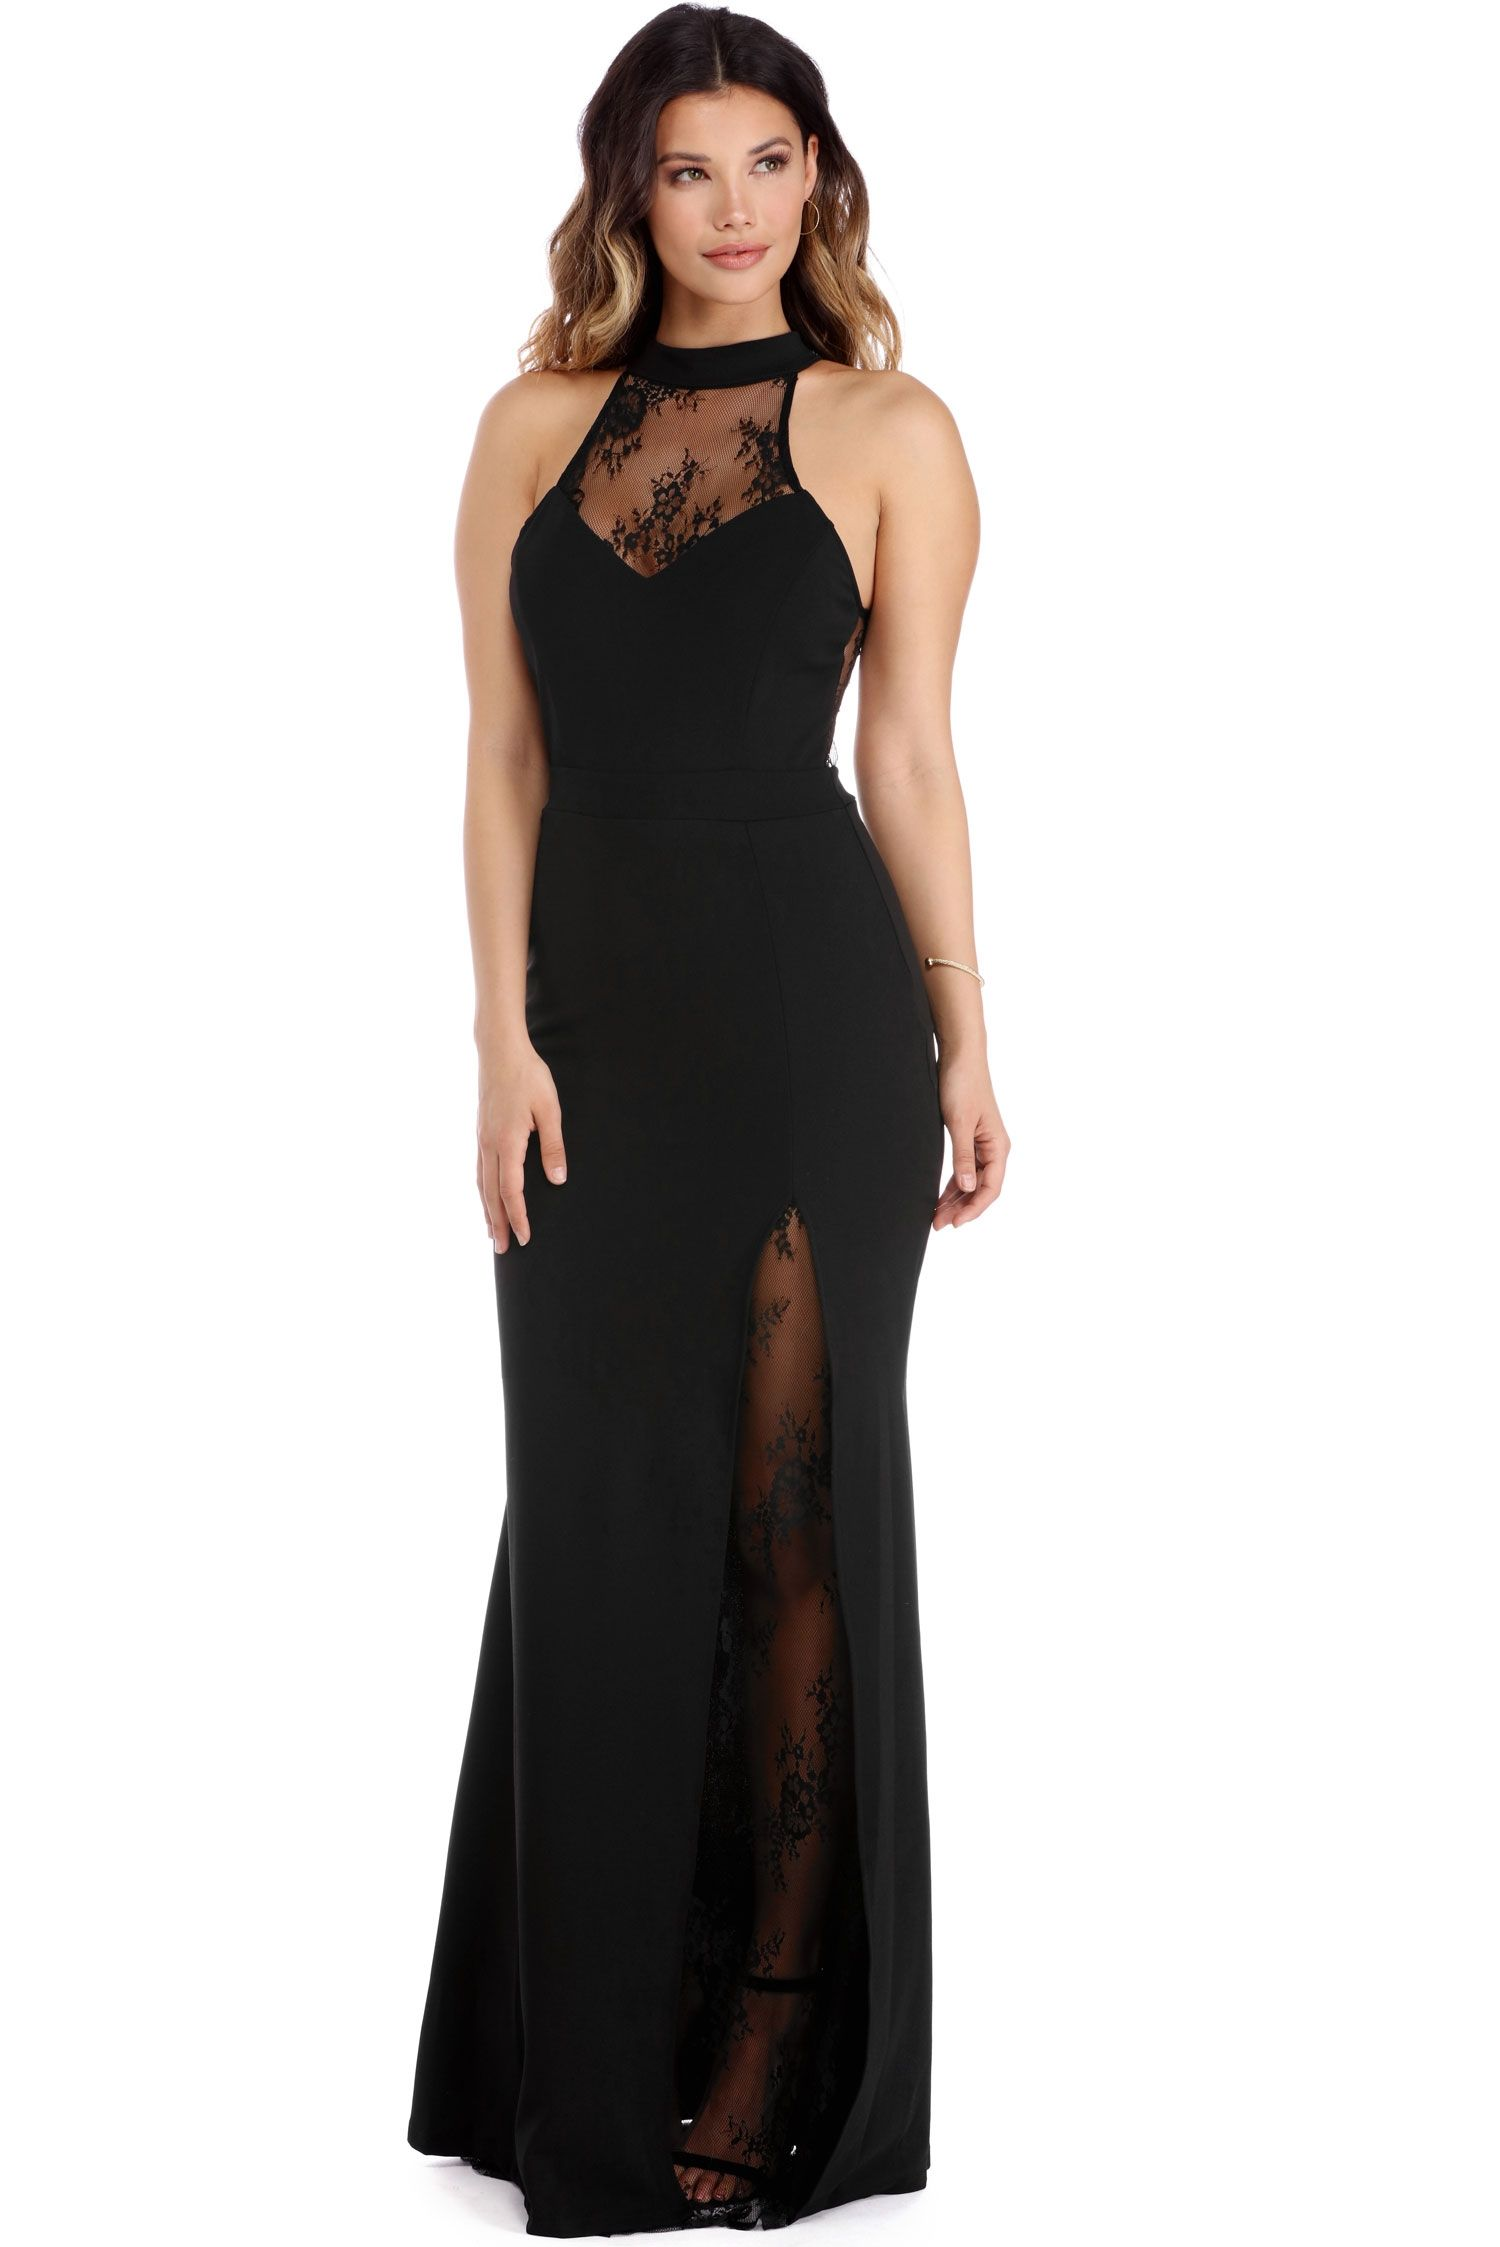 FINAL SALE - Kia Black Lace Crepe Dress